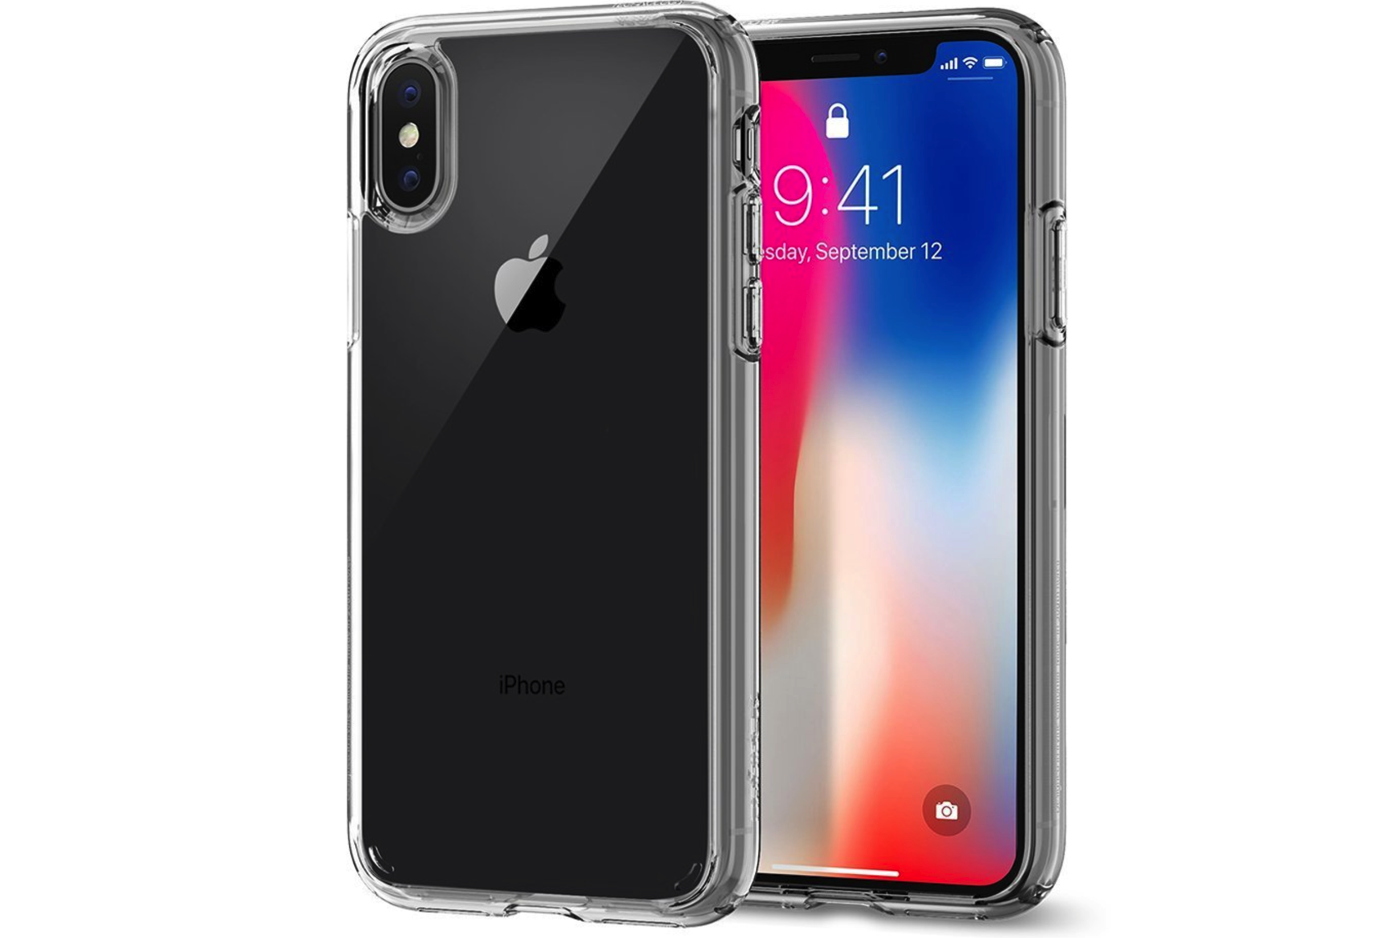 Spigen】iPhone X ケース, [ 米軍MIL規格取得 落下 衝撃 吸収 ] ウルトラ・ハイブリッド アイフォン X 用 耐衝撃 カバー